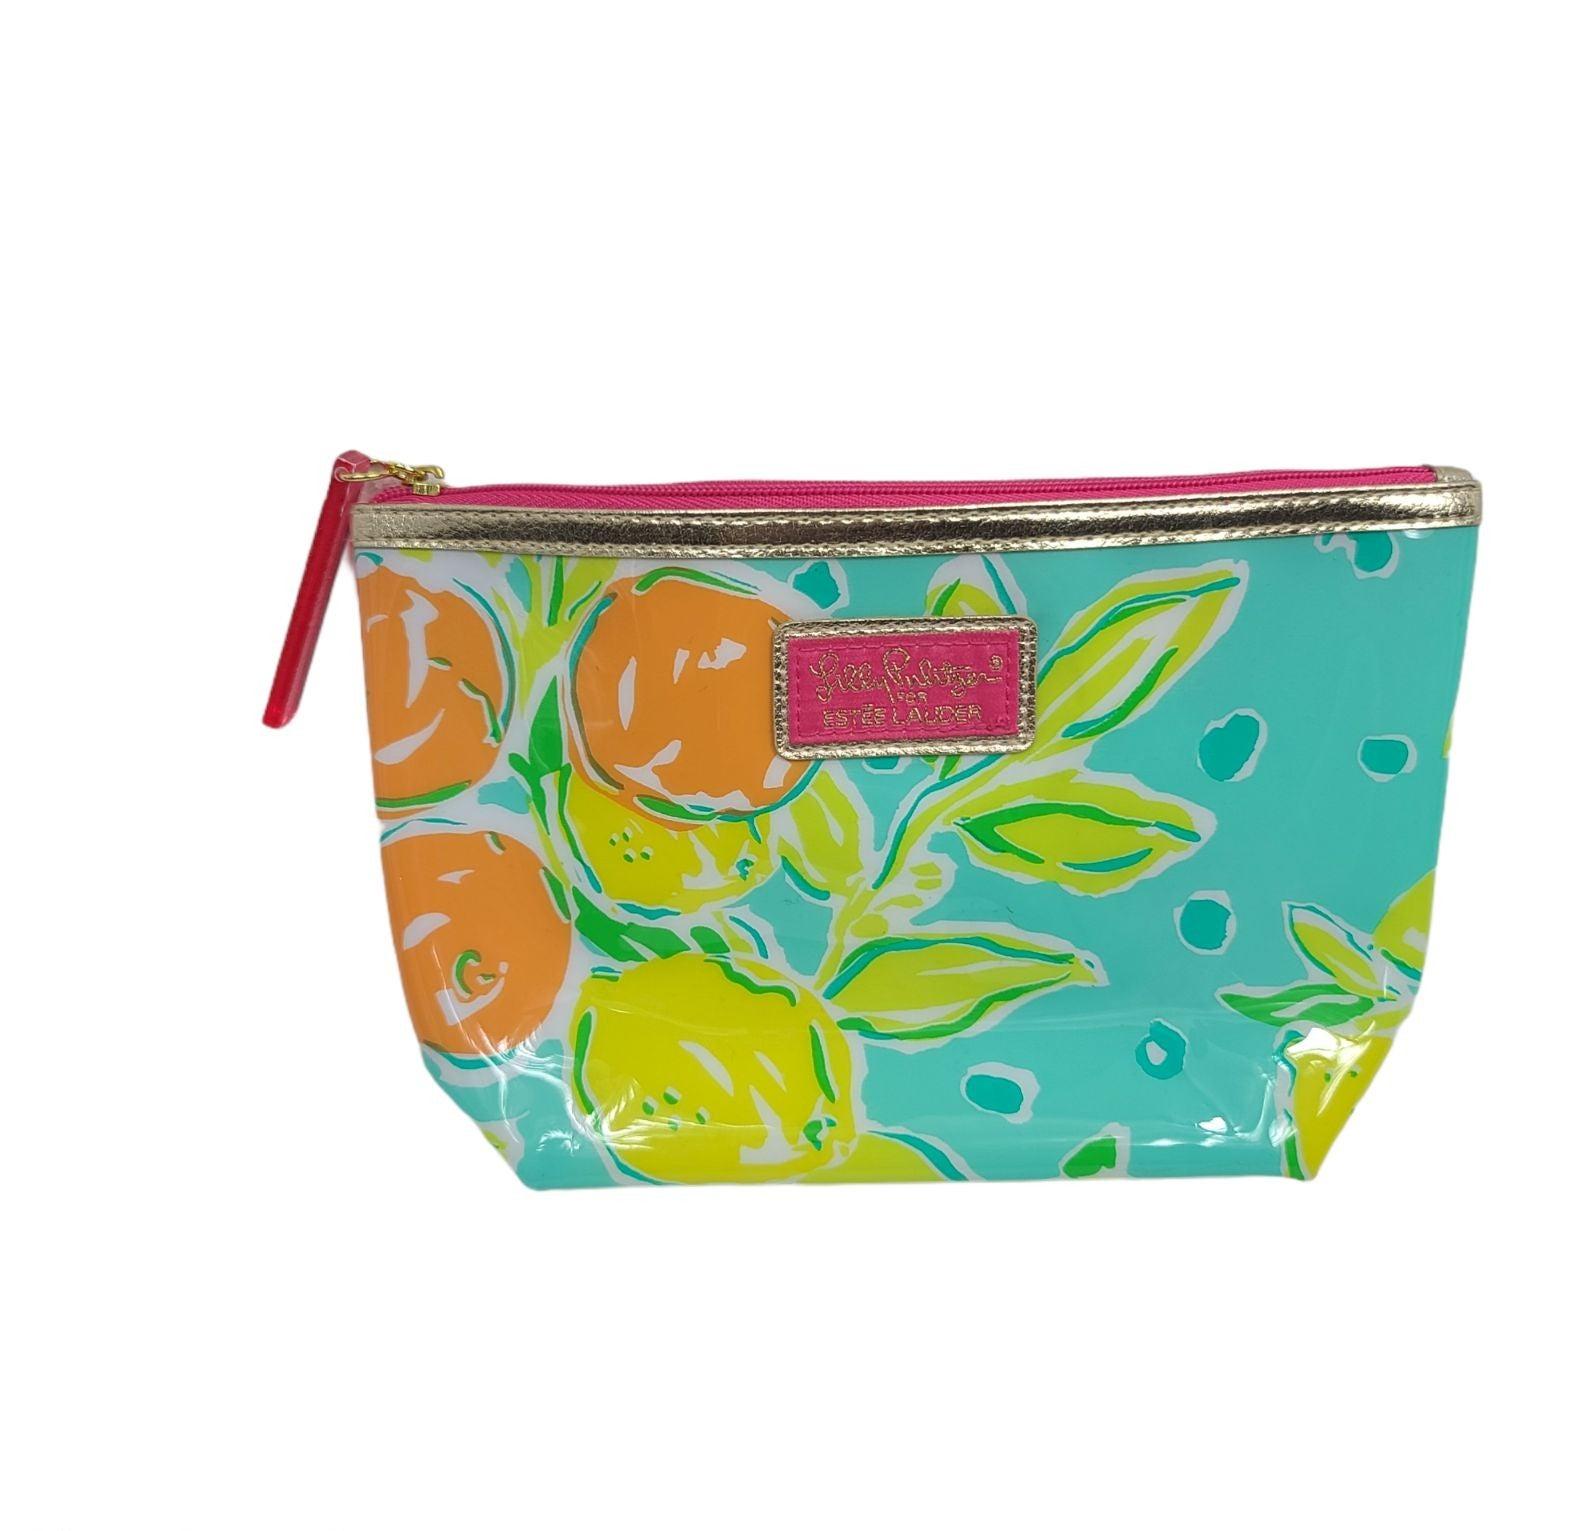 Lilly Pulitzer X Estee Lauder MakeUp Bag